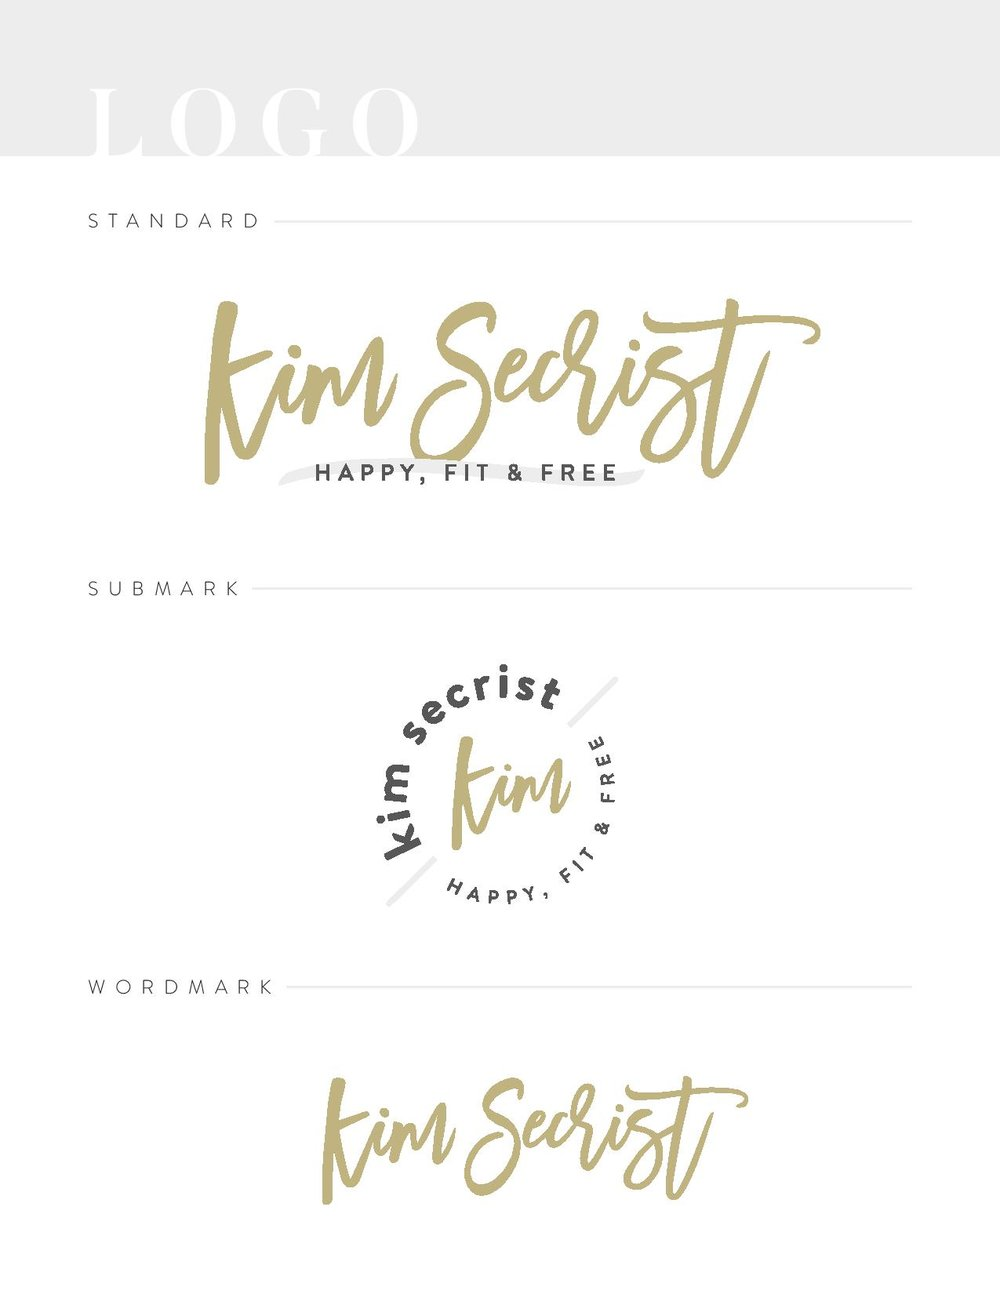 Kim Secrist Brand Guide-page-002.jpg